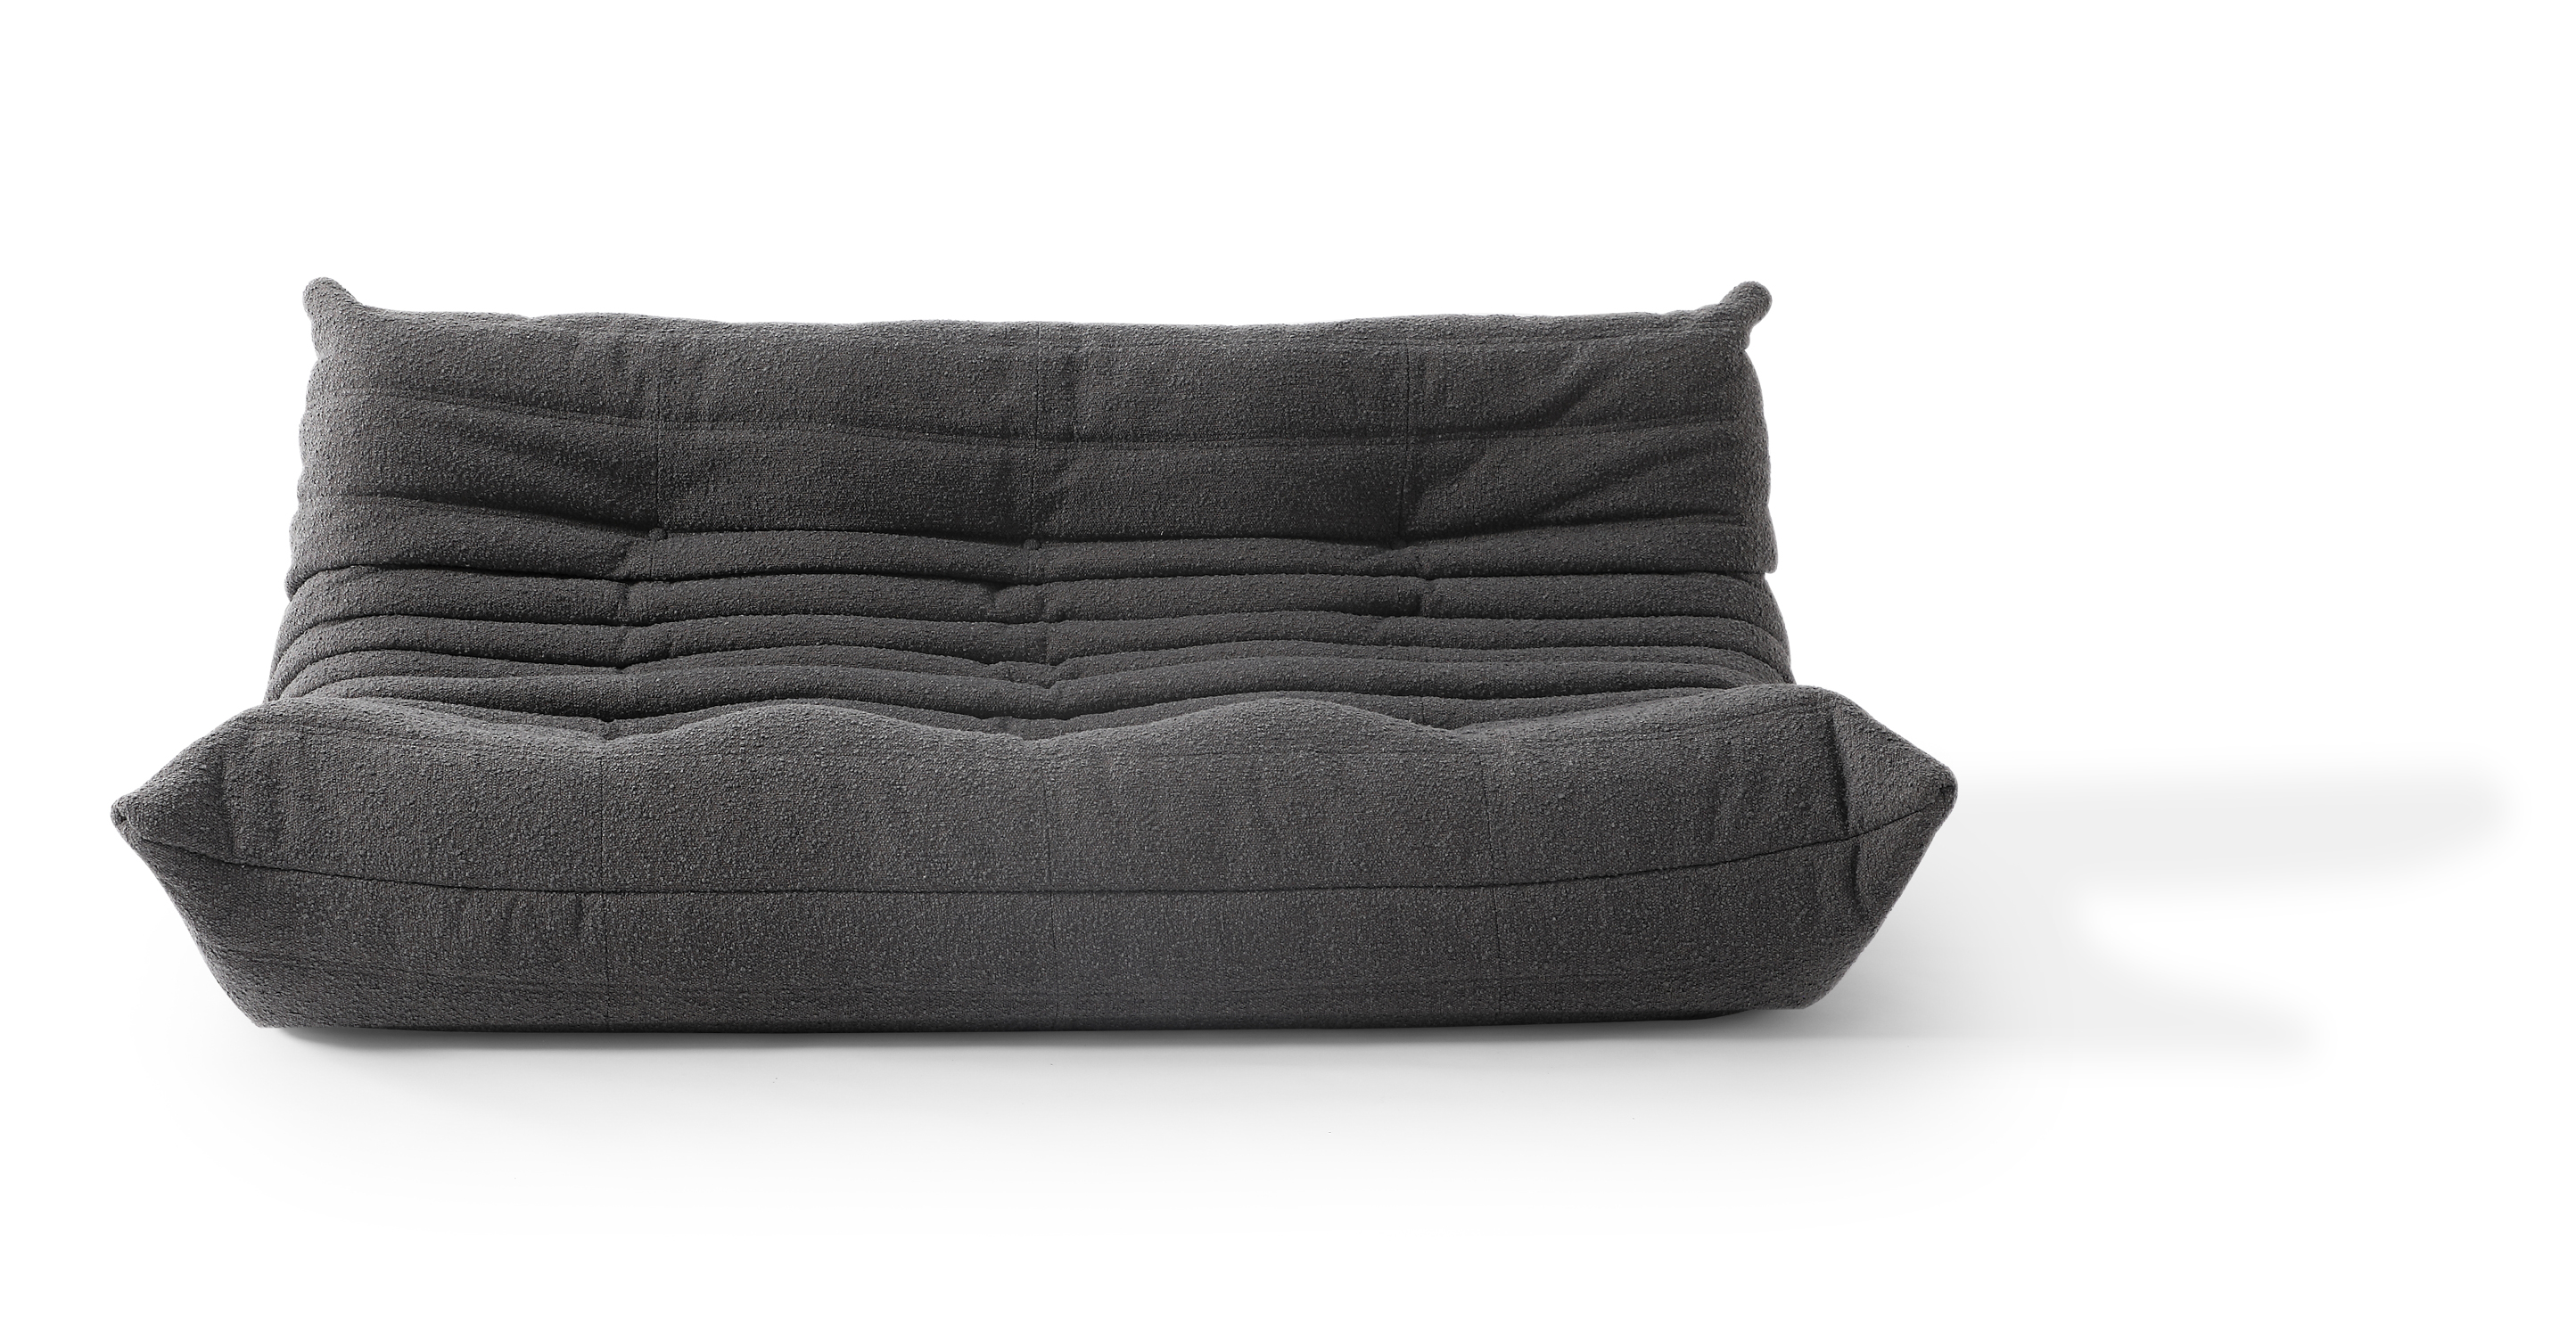 "Louvre 70"" Fabric 3-Seat Sofa, Gris Boucle"